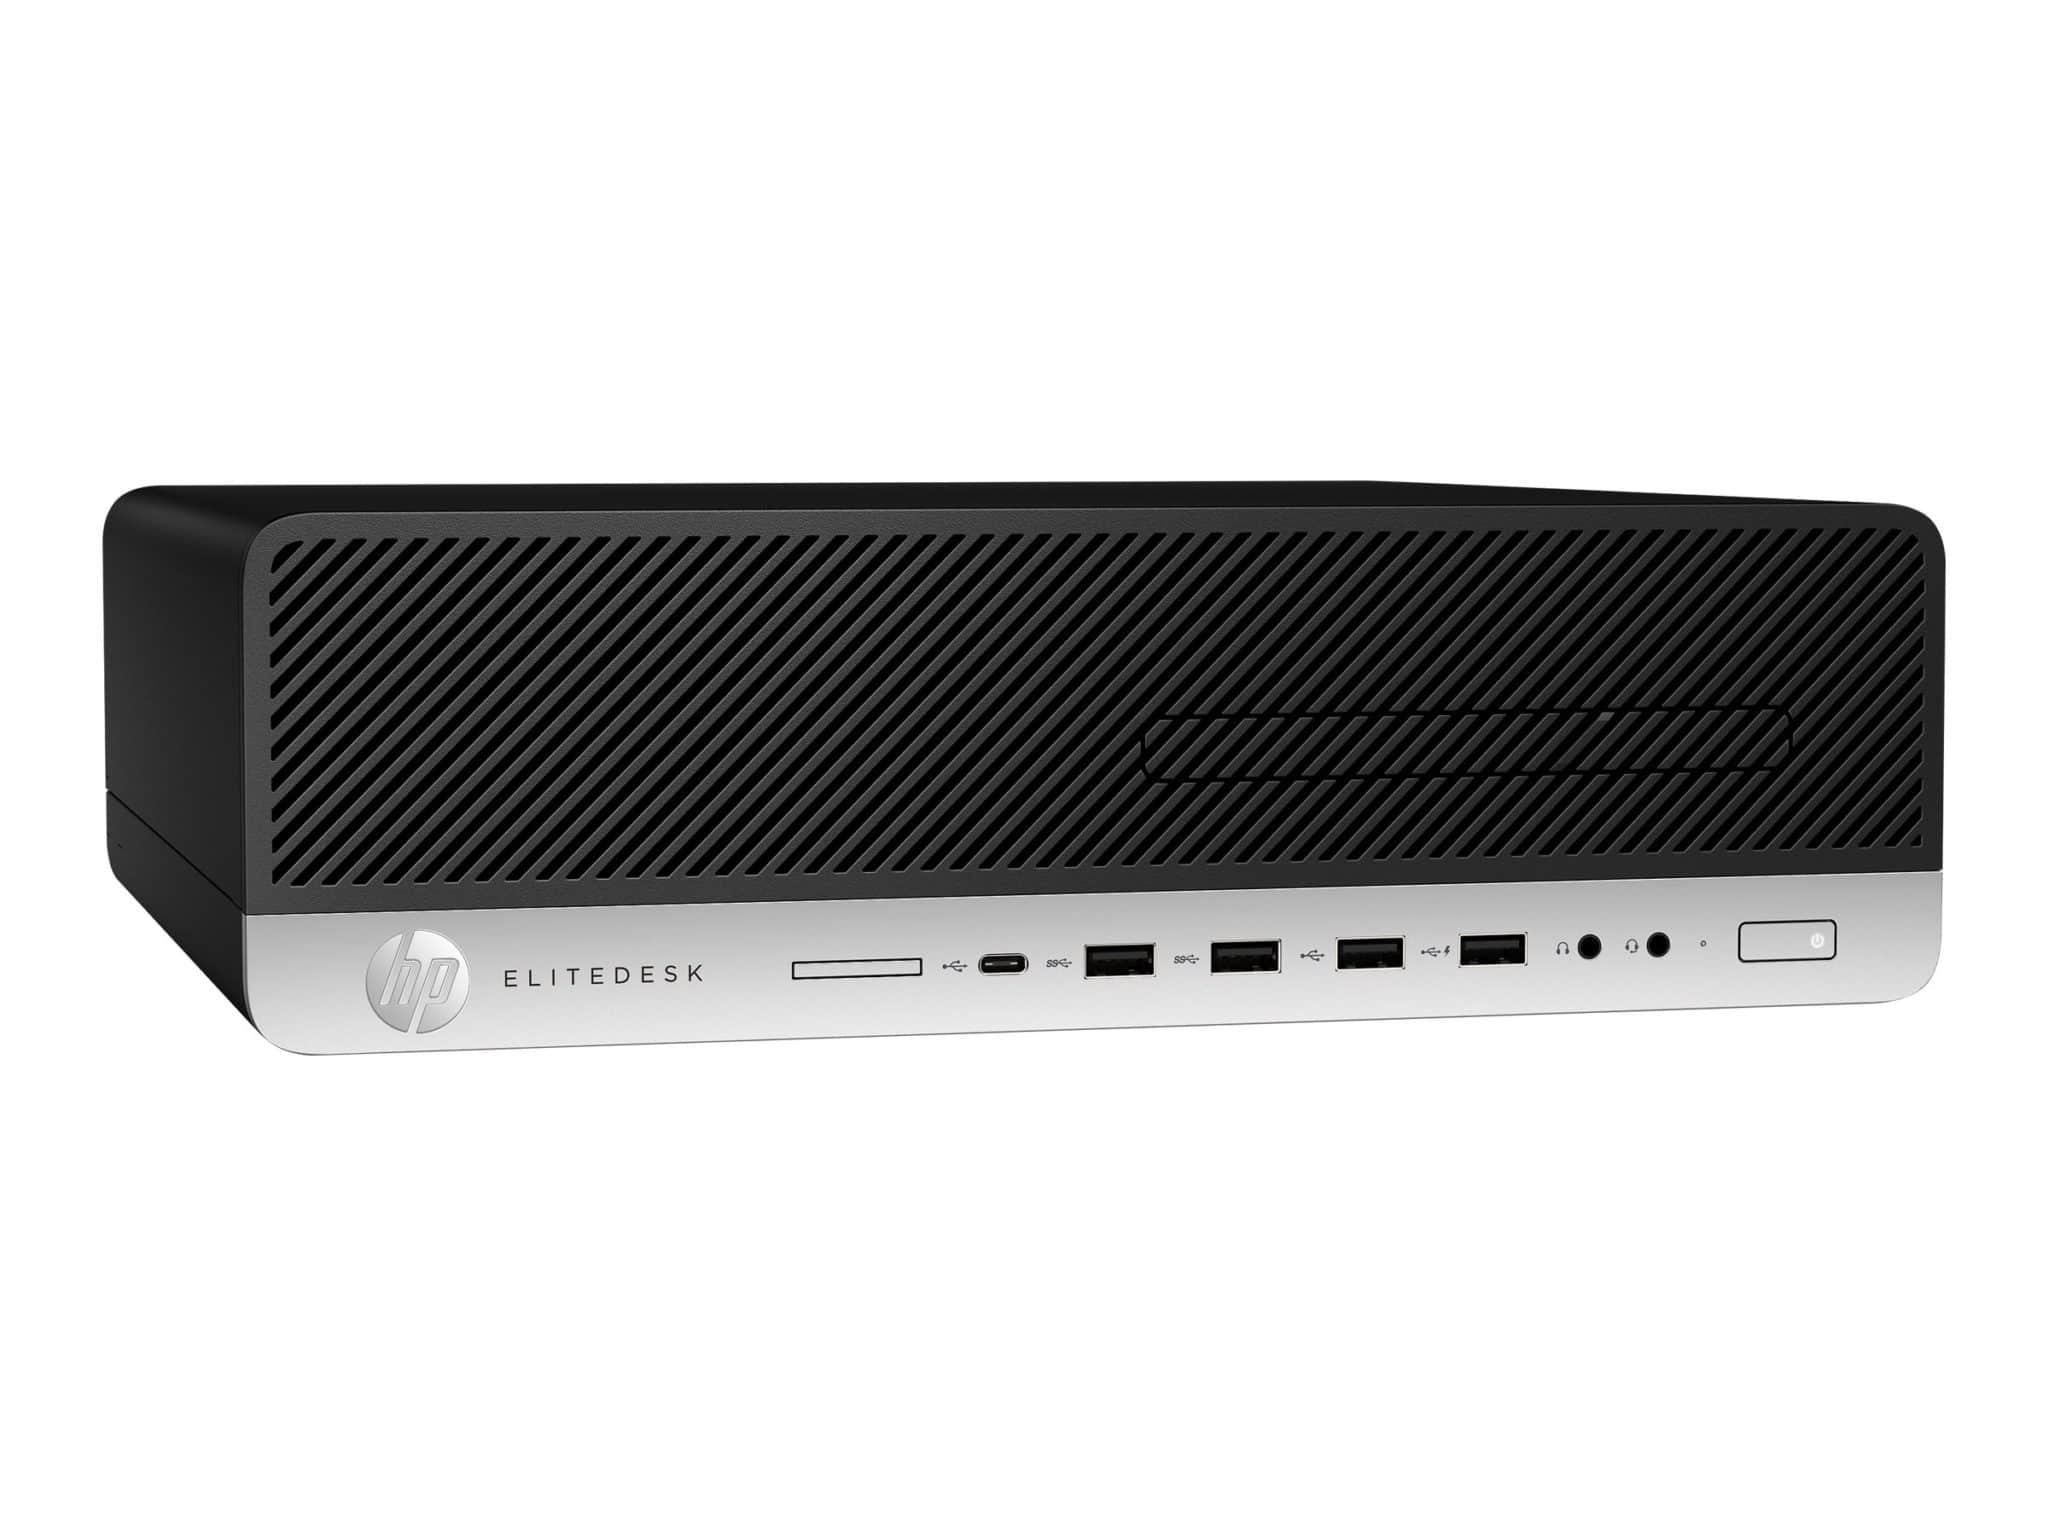 HP EliteDesk 800 G4 - Smart Buy - SFF - Core i5 8500 3 GHz - 8 GB - 1 TB - Desktop